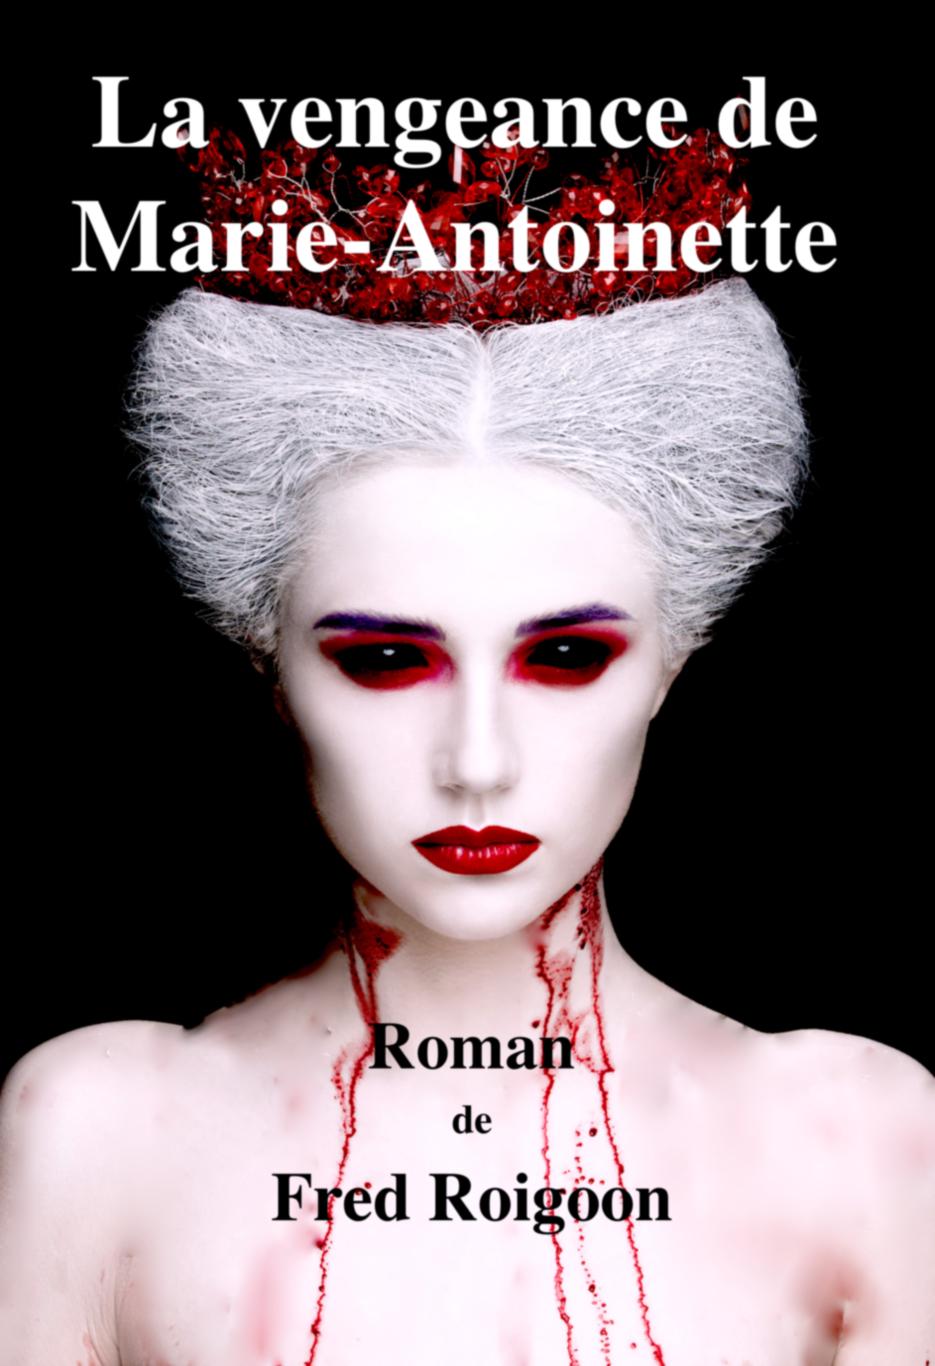 La vengeance de Marie-Antoinette